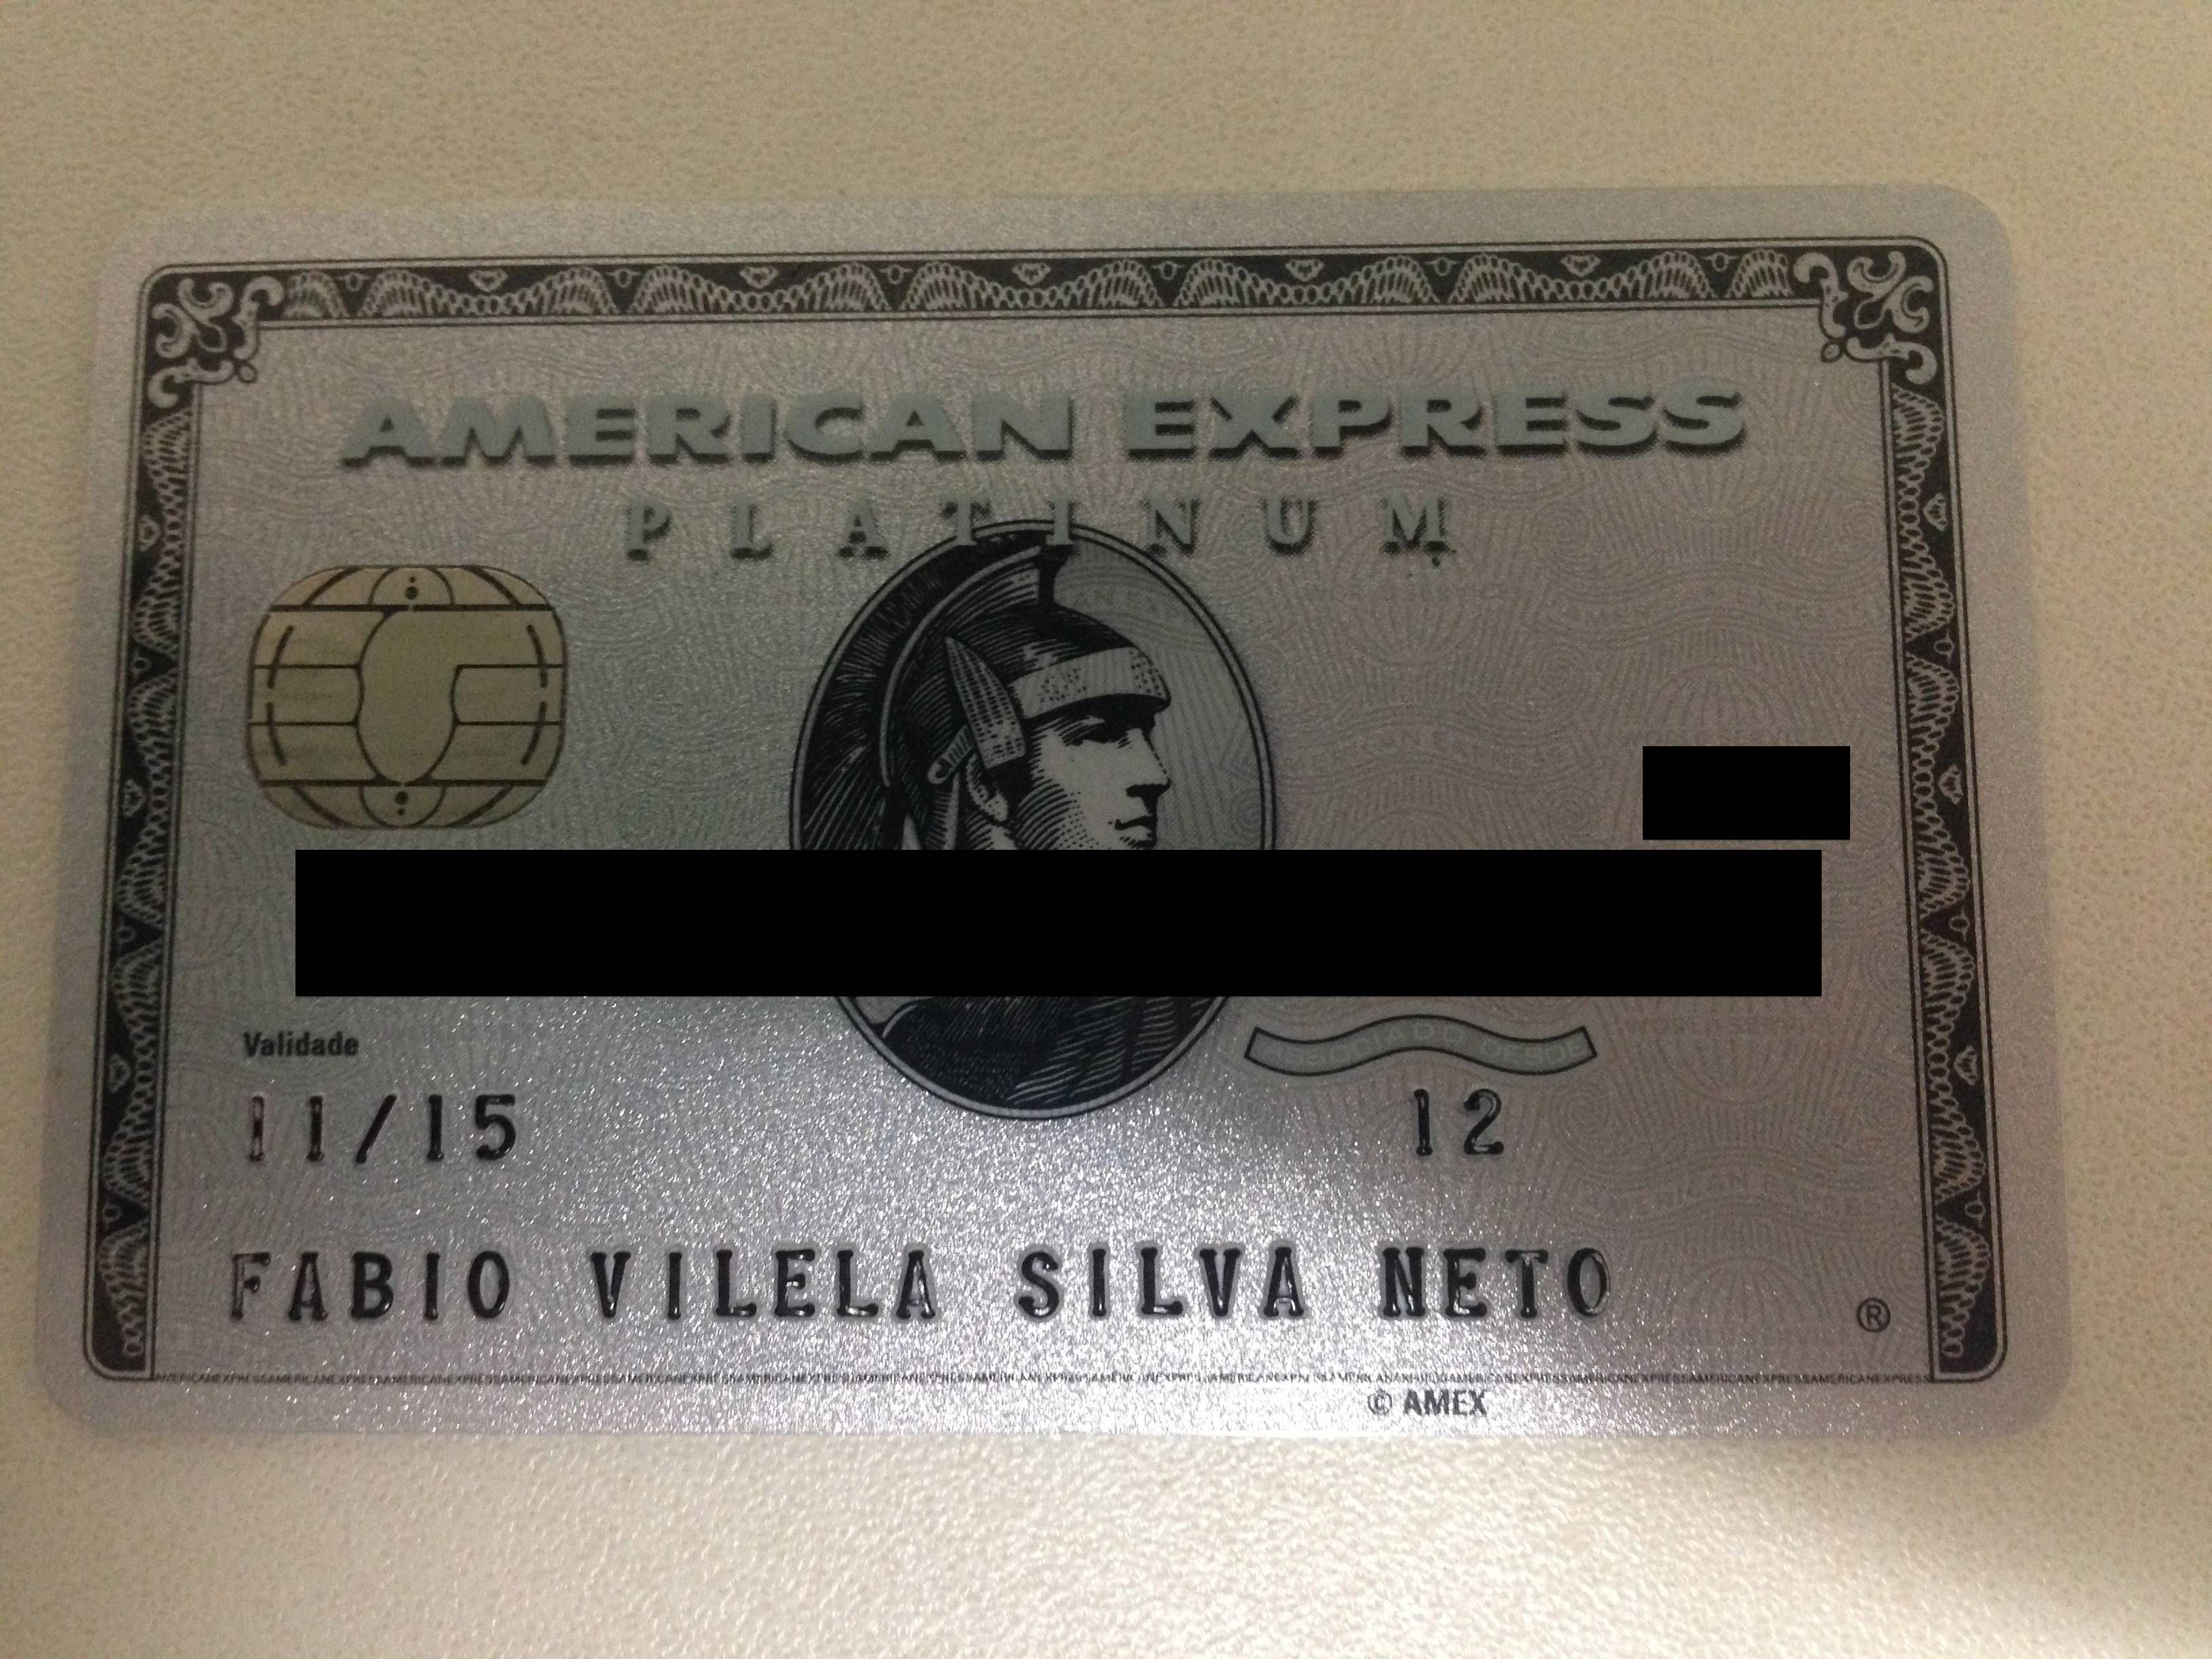 American Express The Platinum Card – Kit de boas vindas